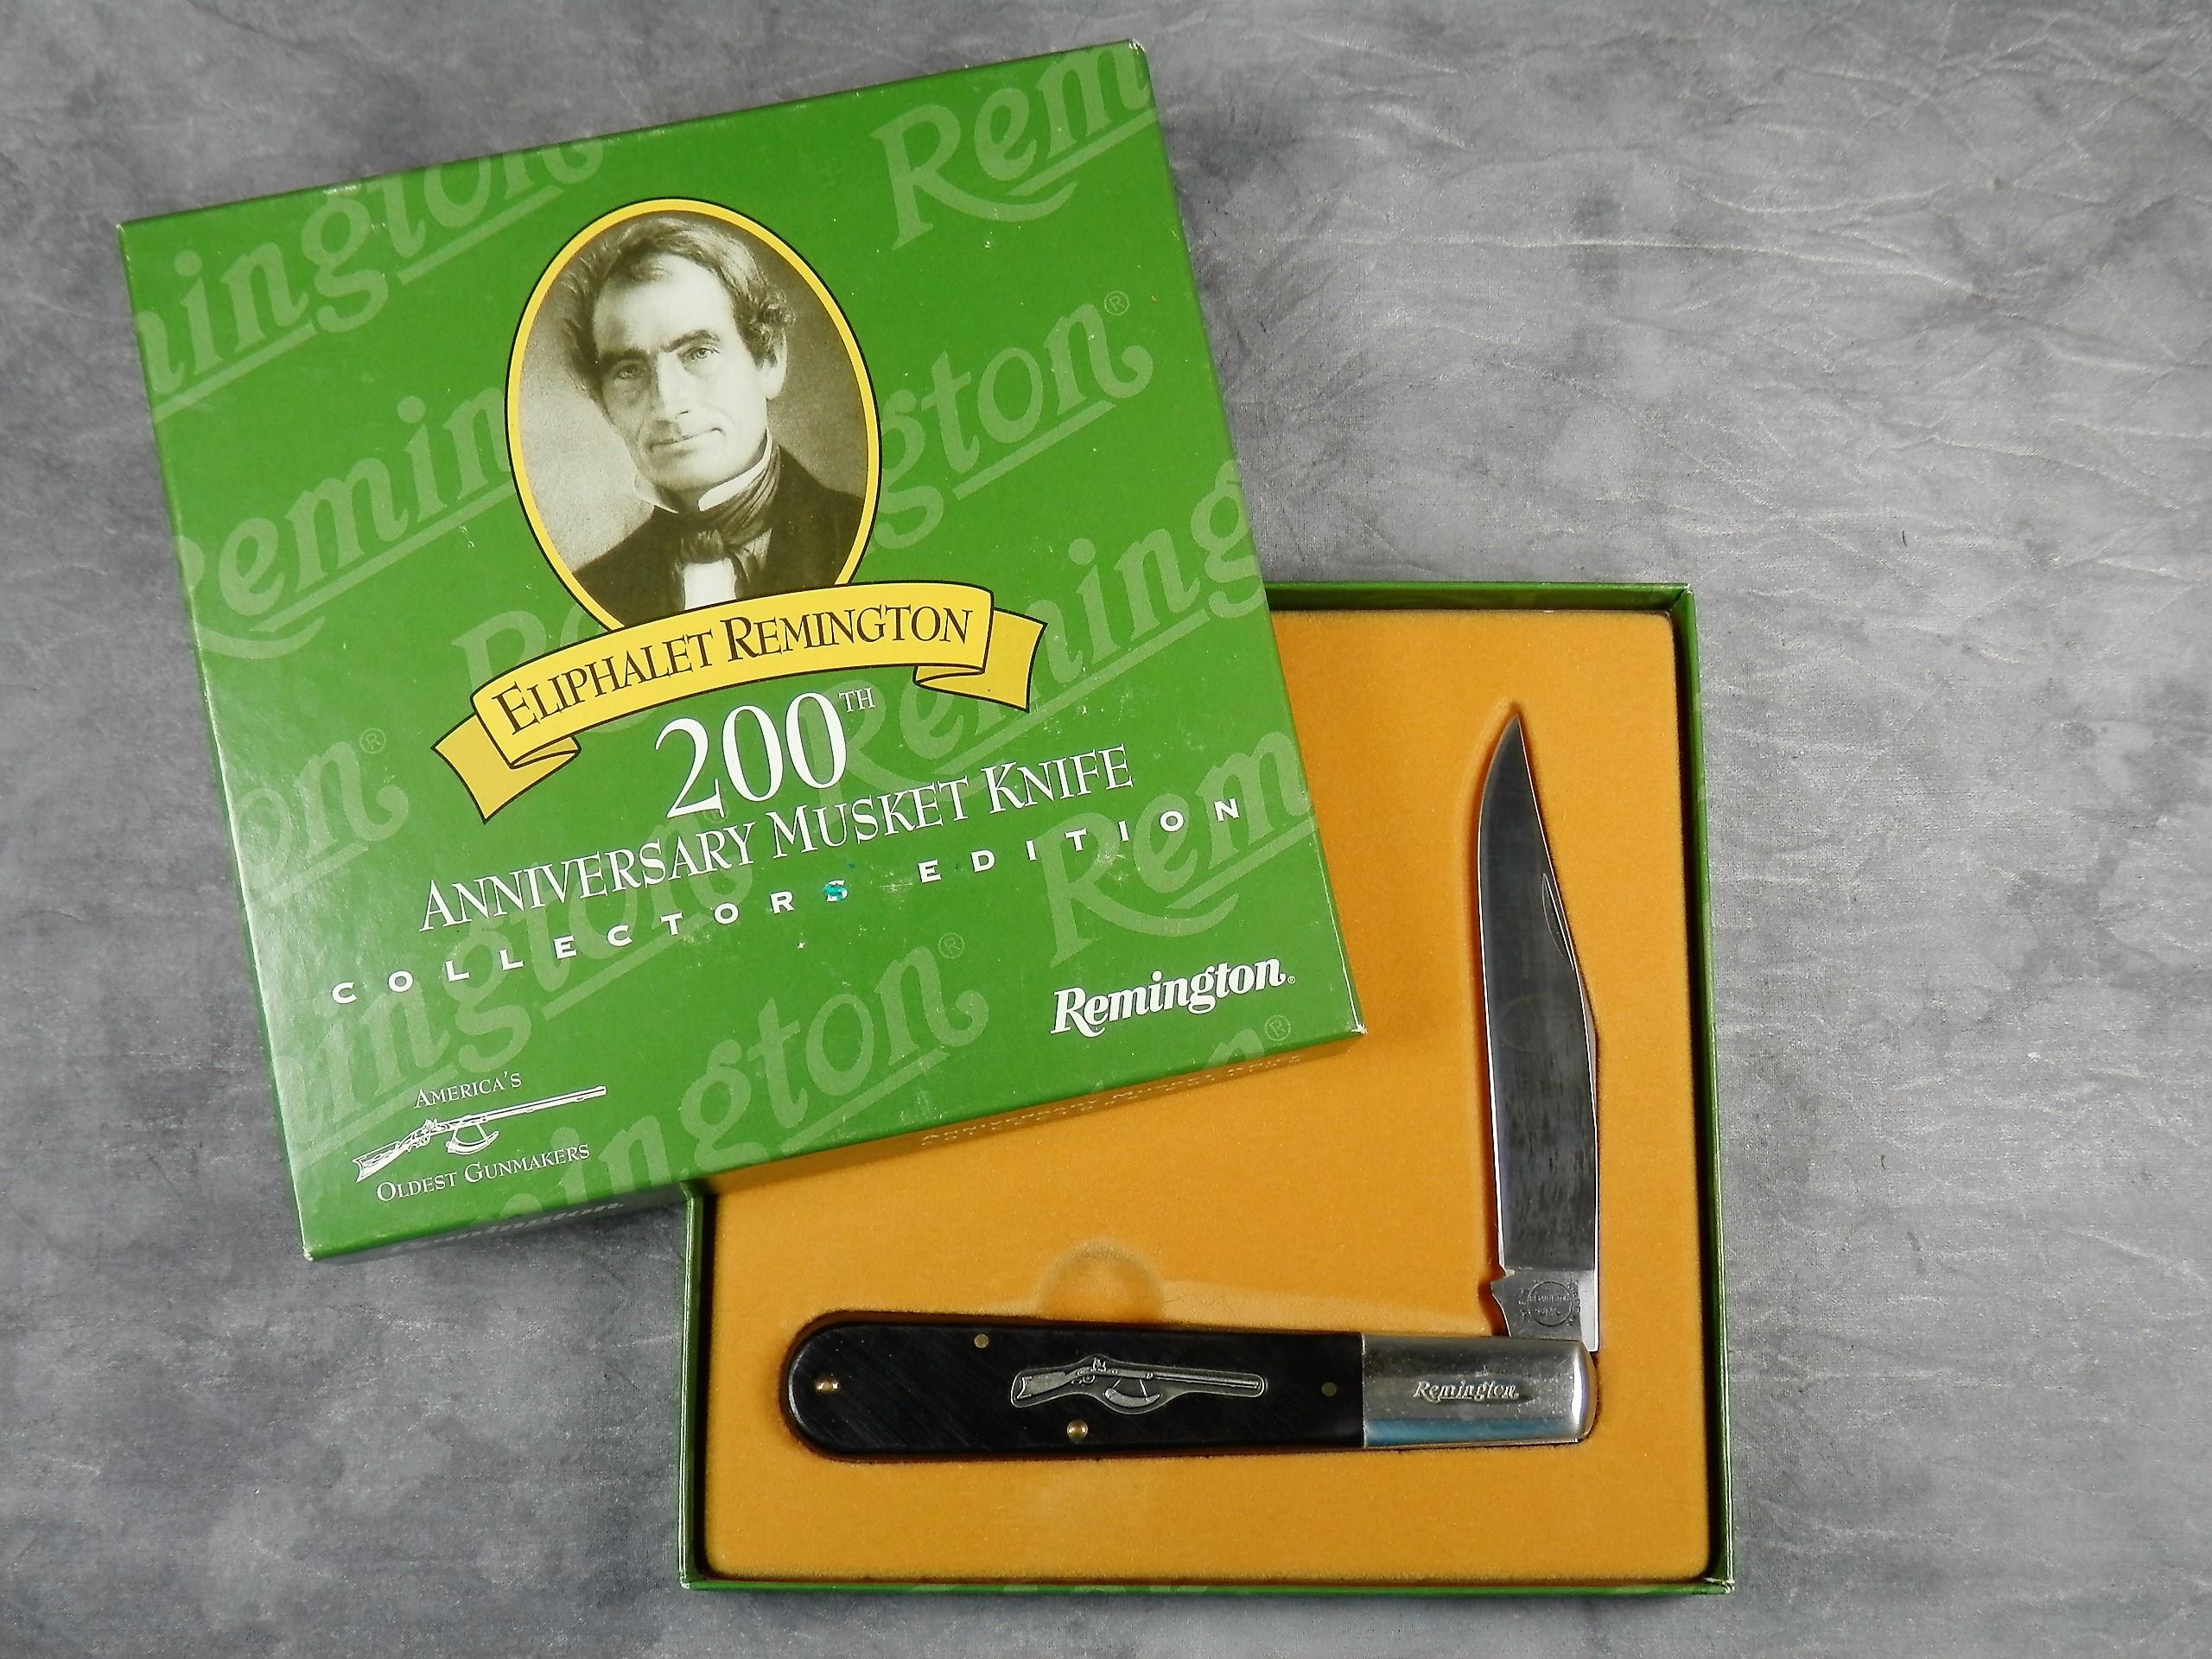 Remington Pocket Knife Tang Stamps